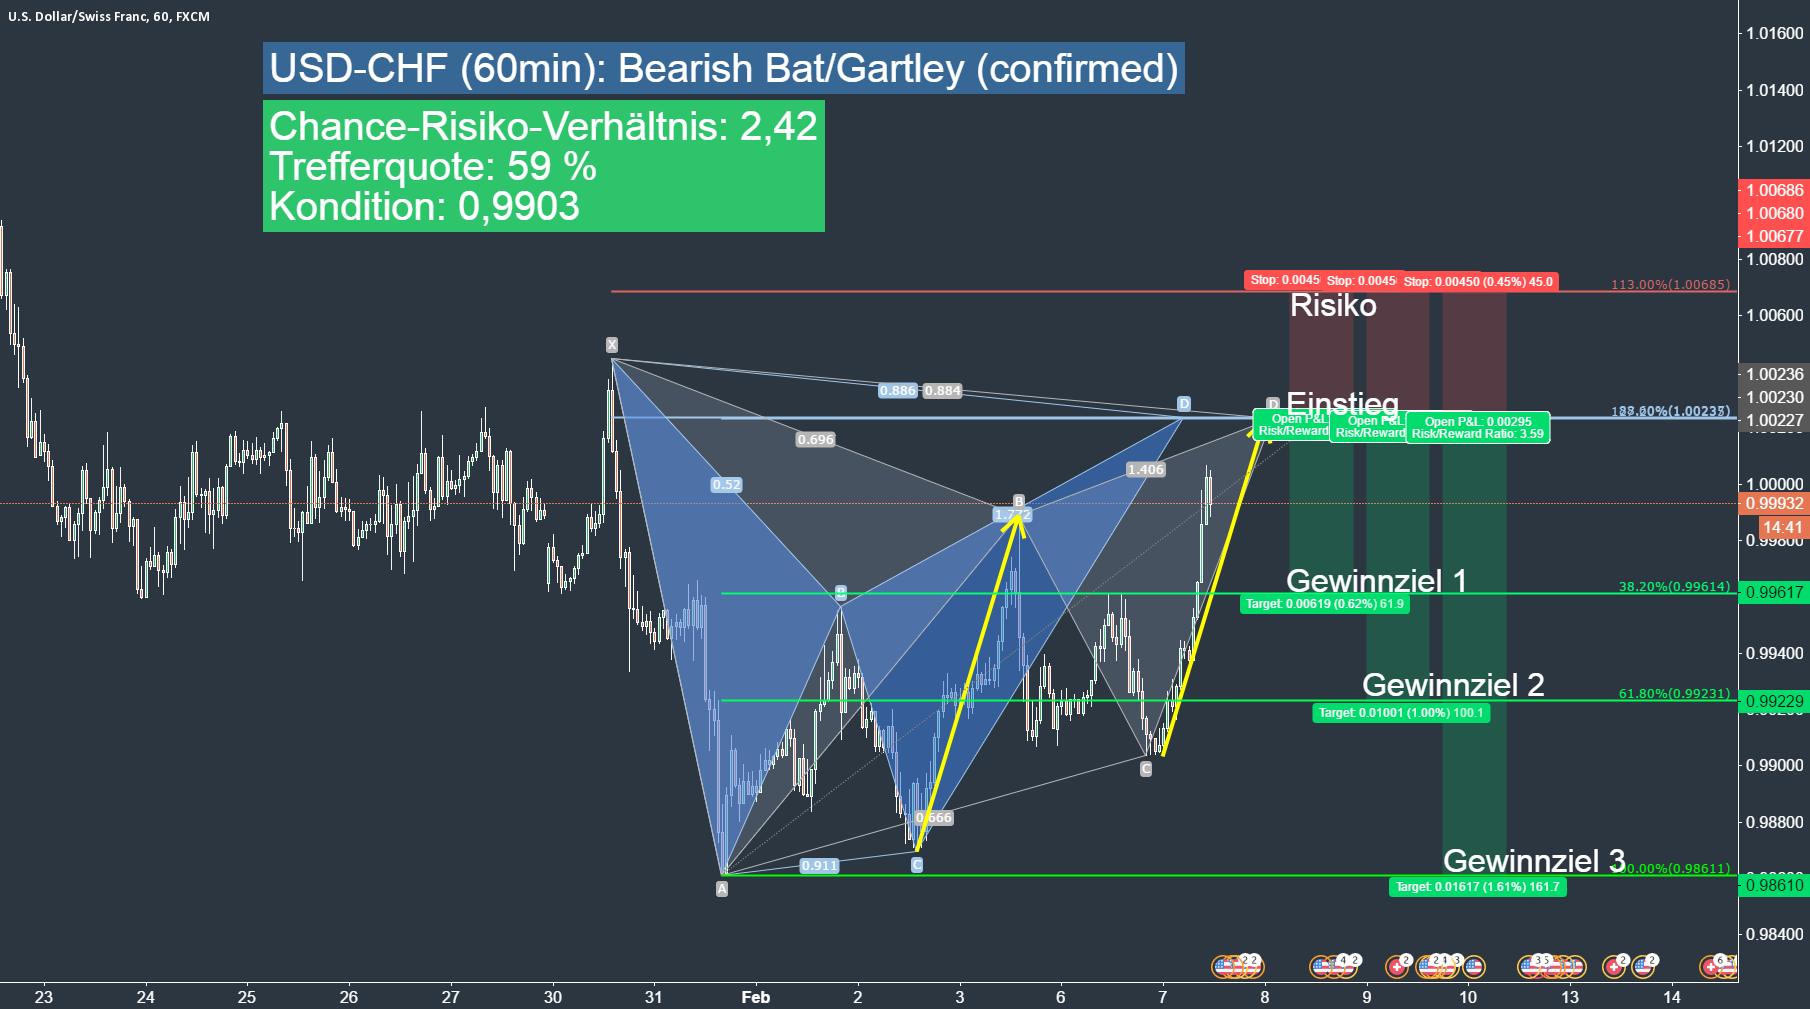 USD-CHF (60min): Triple Play Bat-Gartley-ABCD (confirmed)